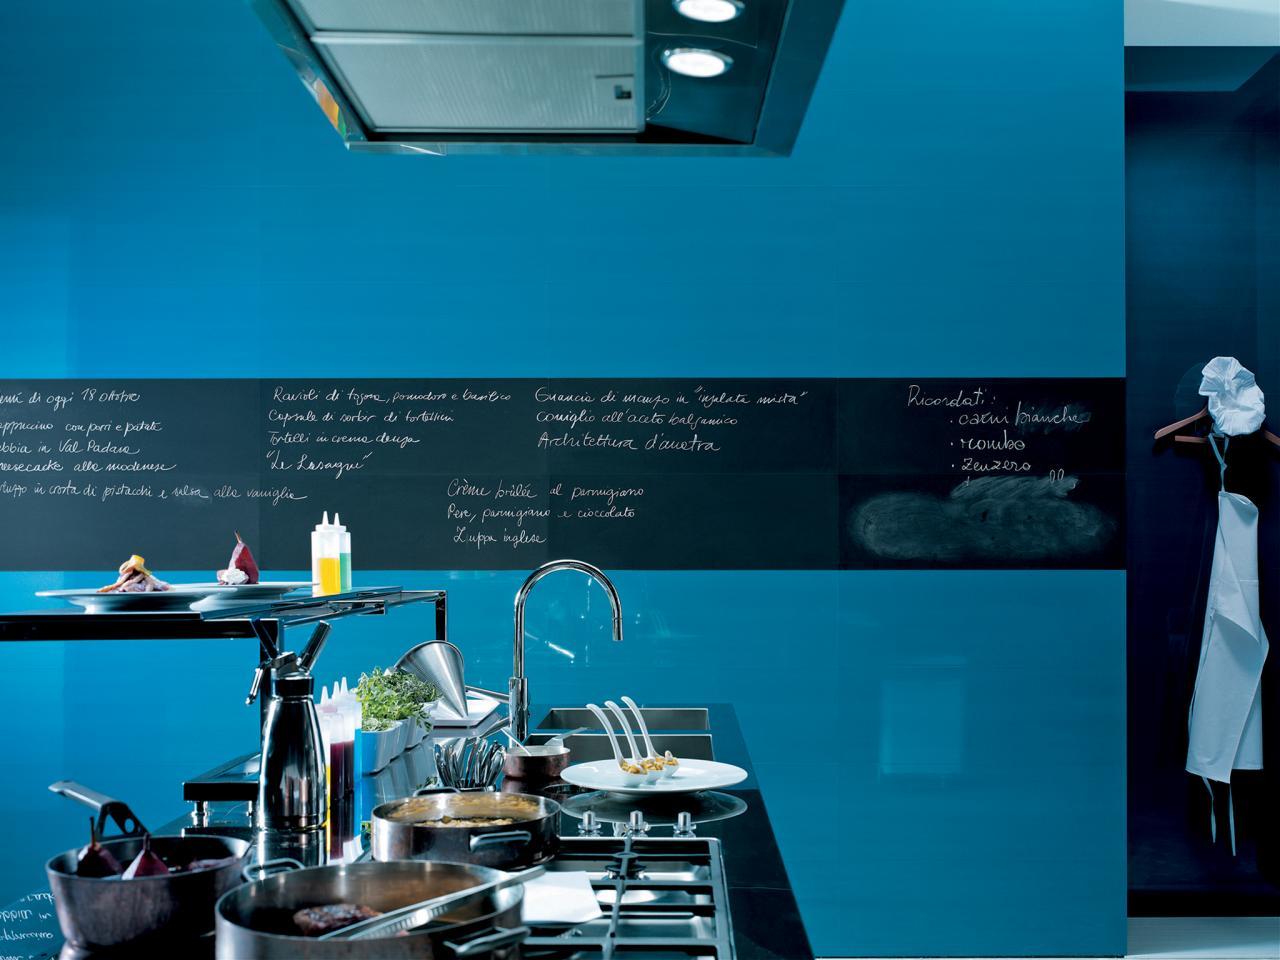 Blue Kitchen With Chalkboard Paint Border | HGTV